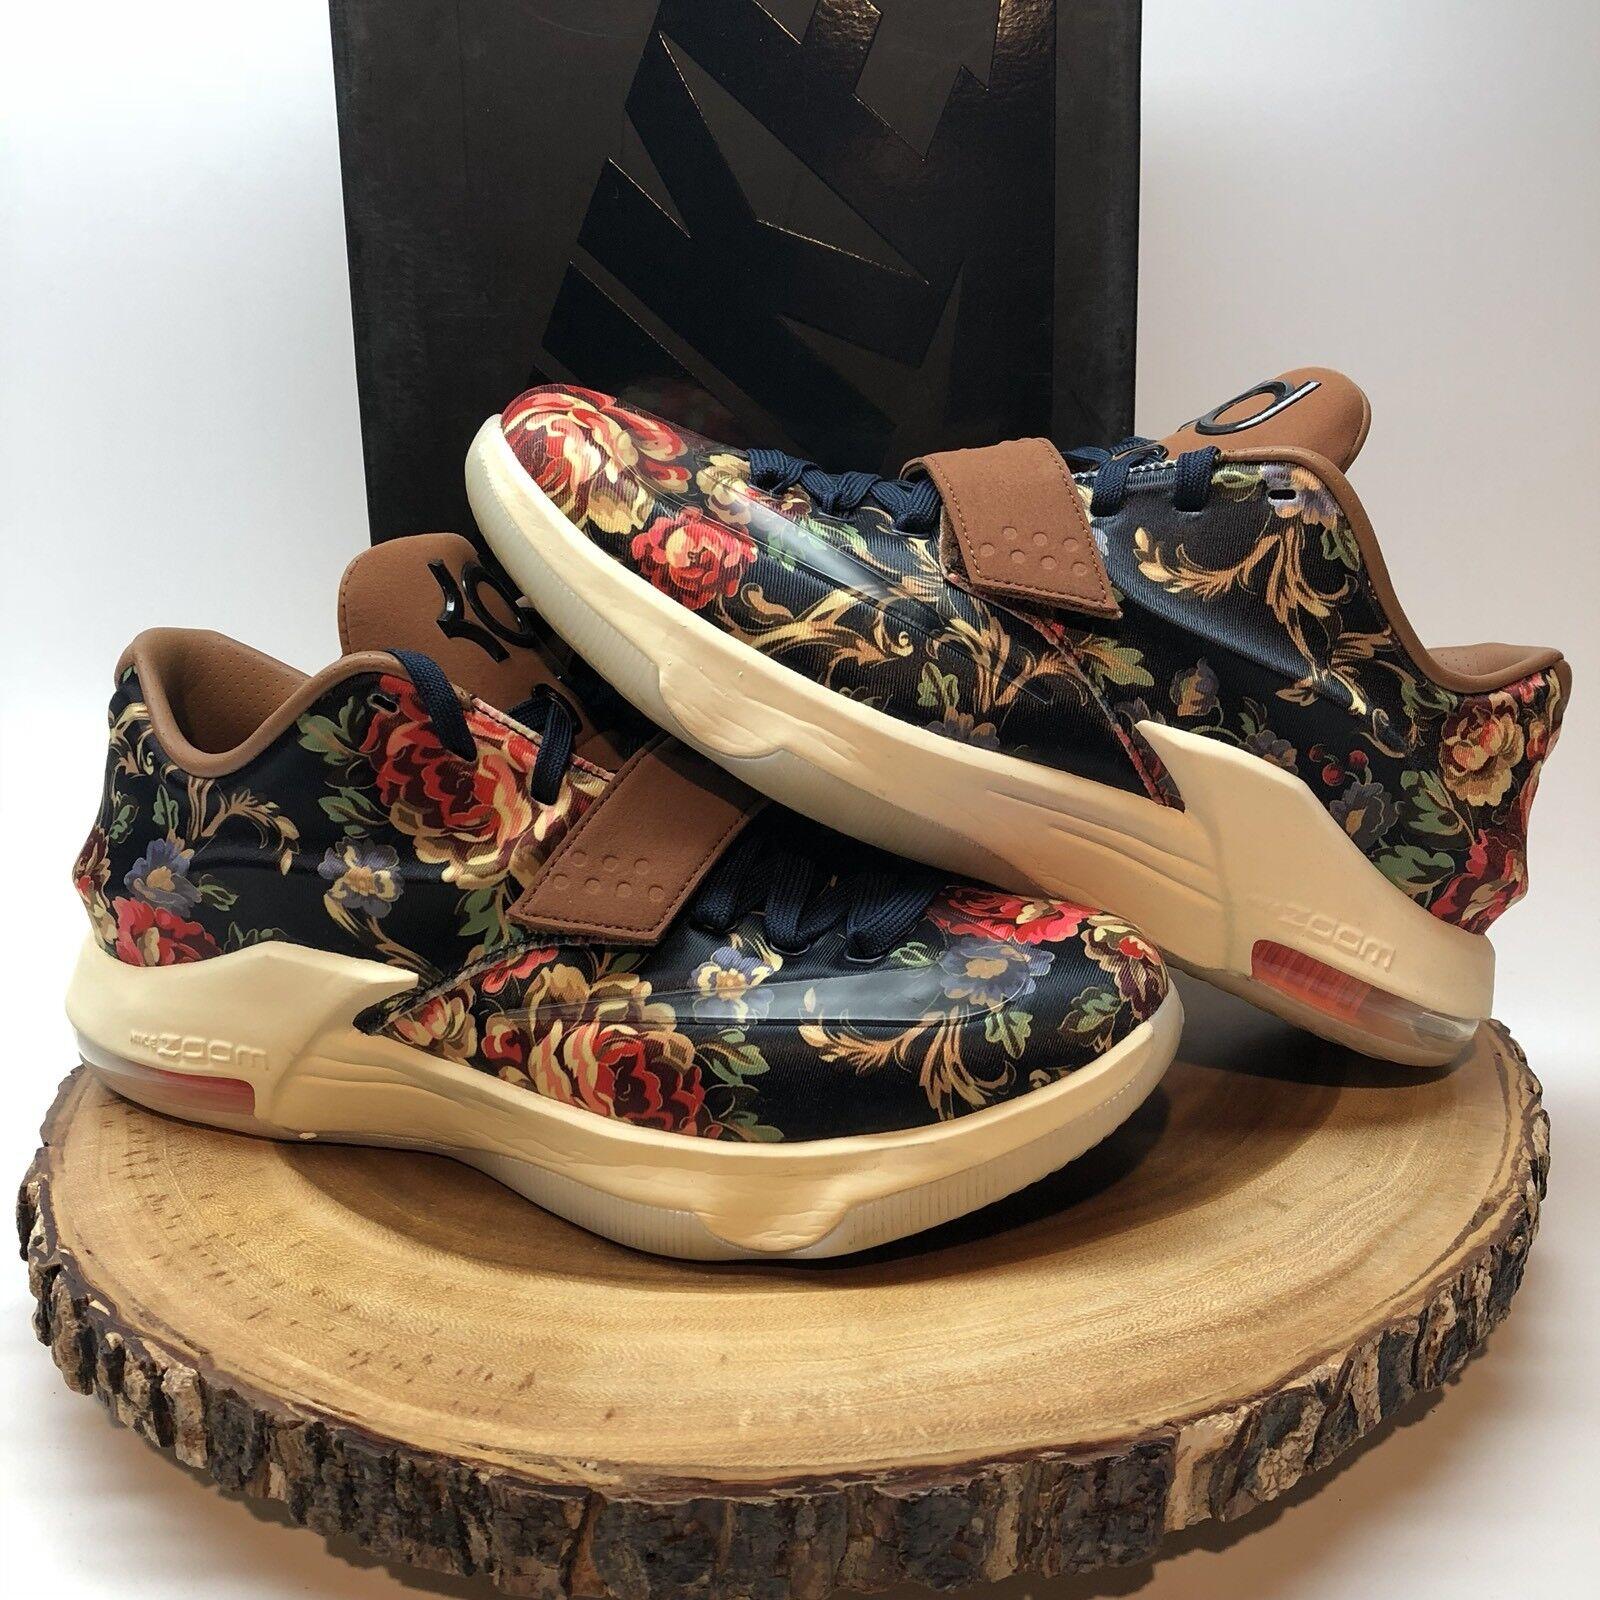 Nike KD VII ext floral QS Midnight Navy / Negro-hazelnut baratos 726438-400 tamaño 10 LeBron baratos Negro-hazelnut zapatos de mujer zapatos de mujer 1c8a48